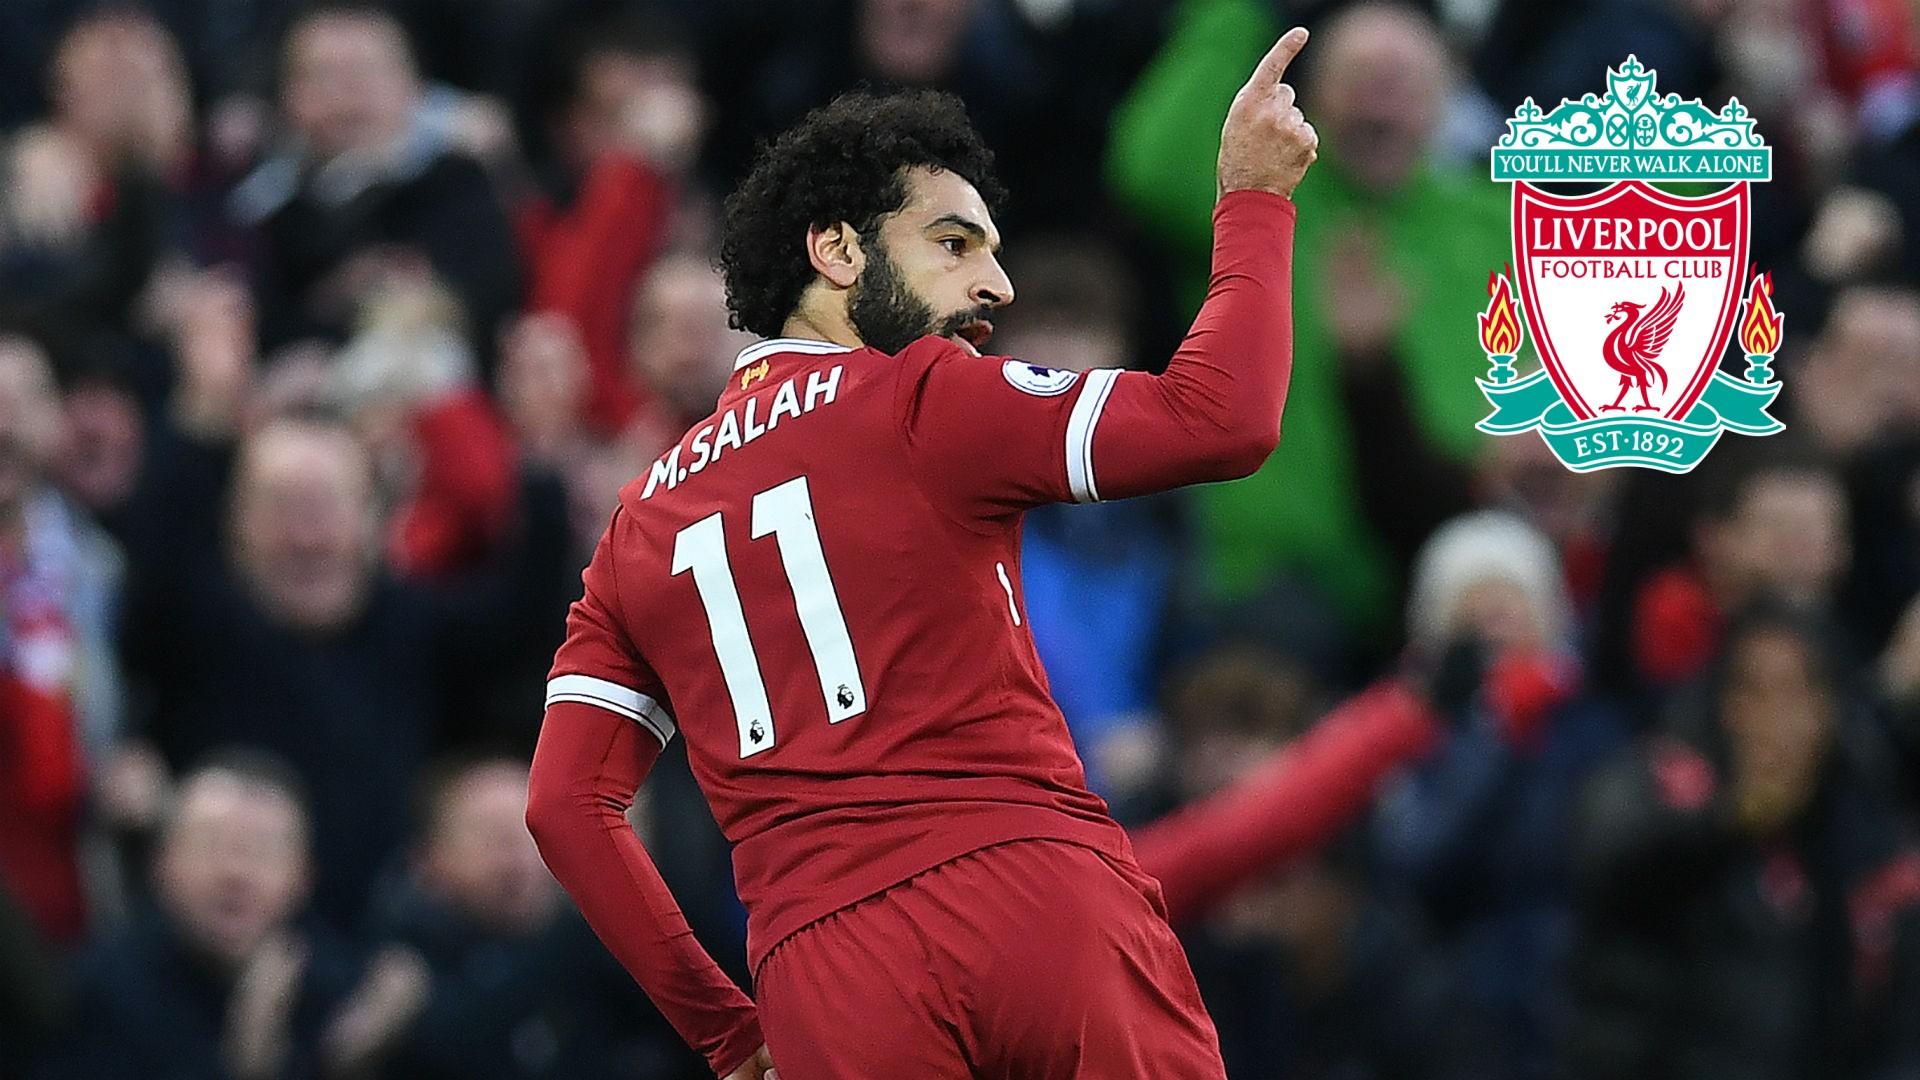 Liverpool Live Wallpaper Iphone Best Mohamed Salah Liverpool Wallpaper Hd 2018 Wallpapers Hd